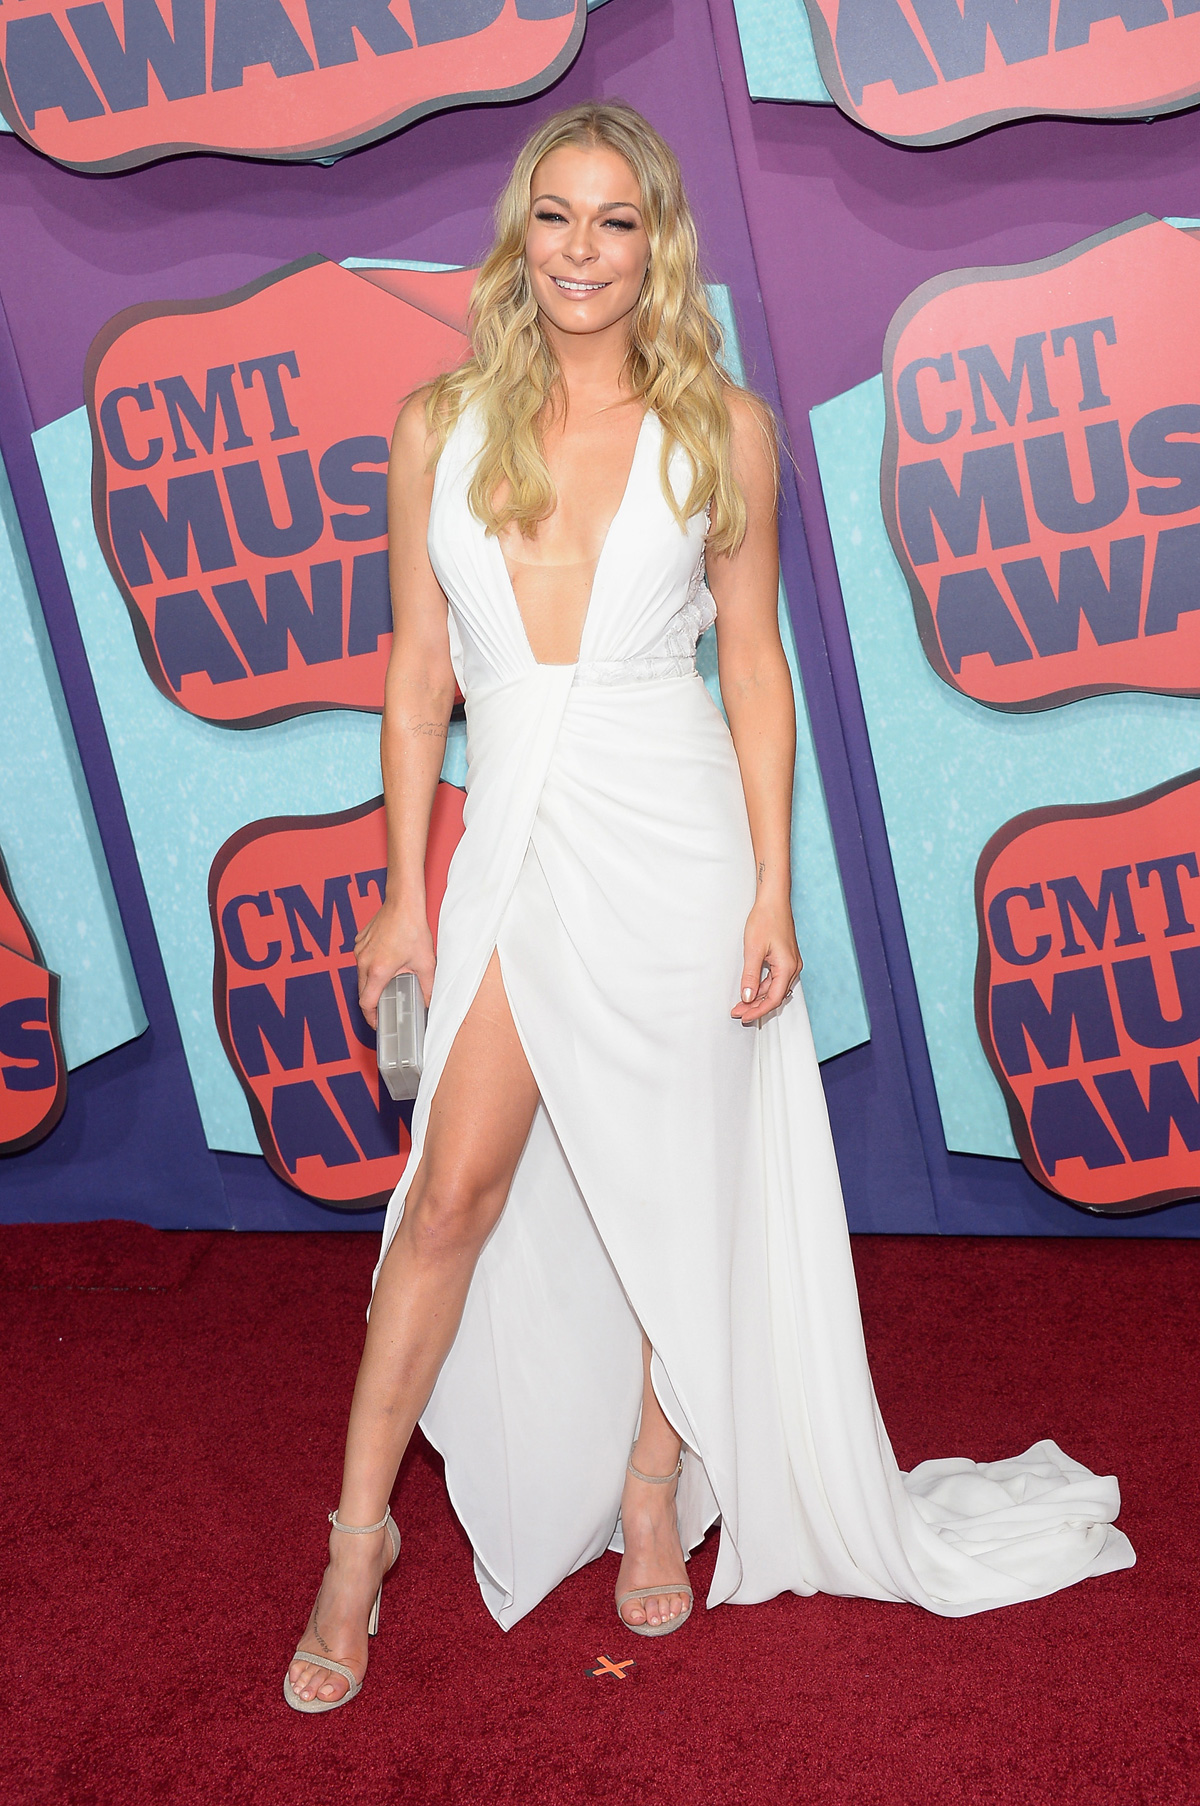 LeAnn Rimesat the the 2014 CMT Music Awards